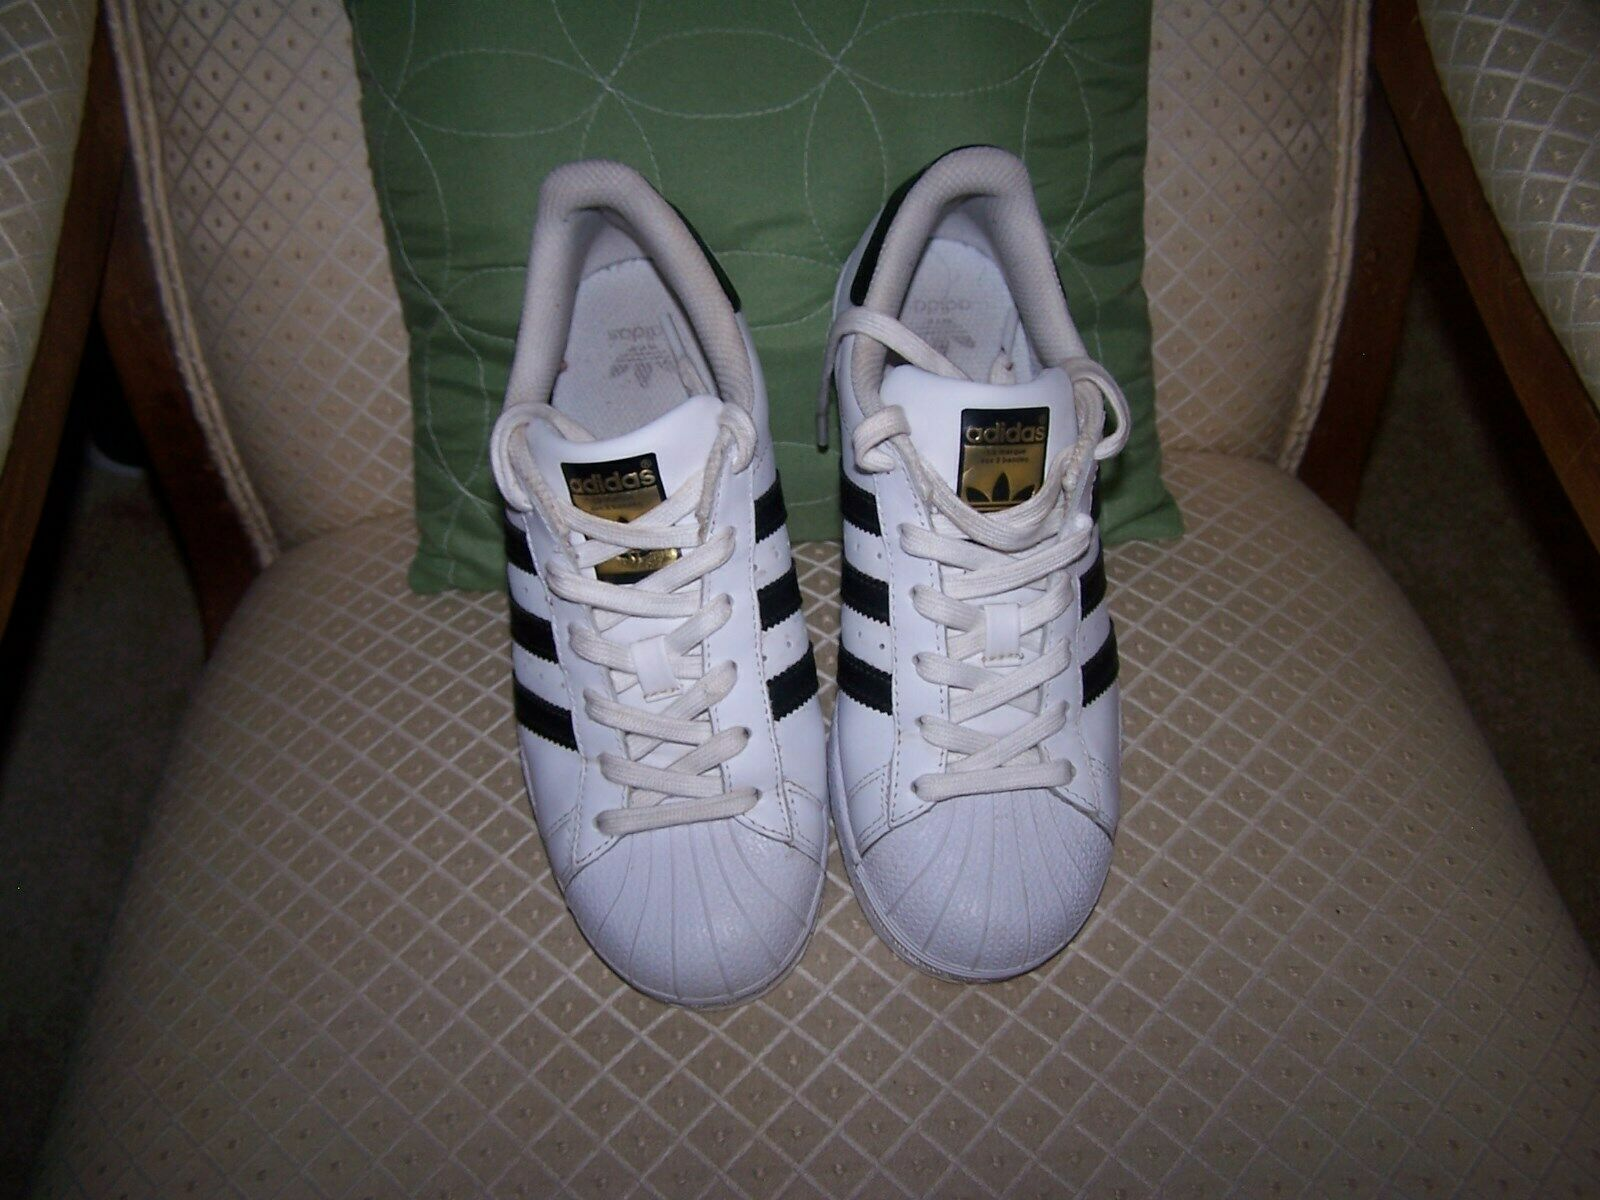 size 5 adidas superstar